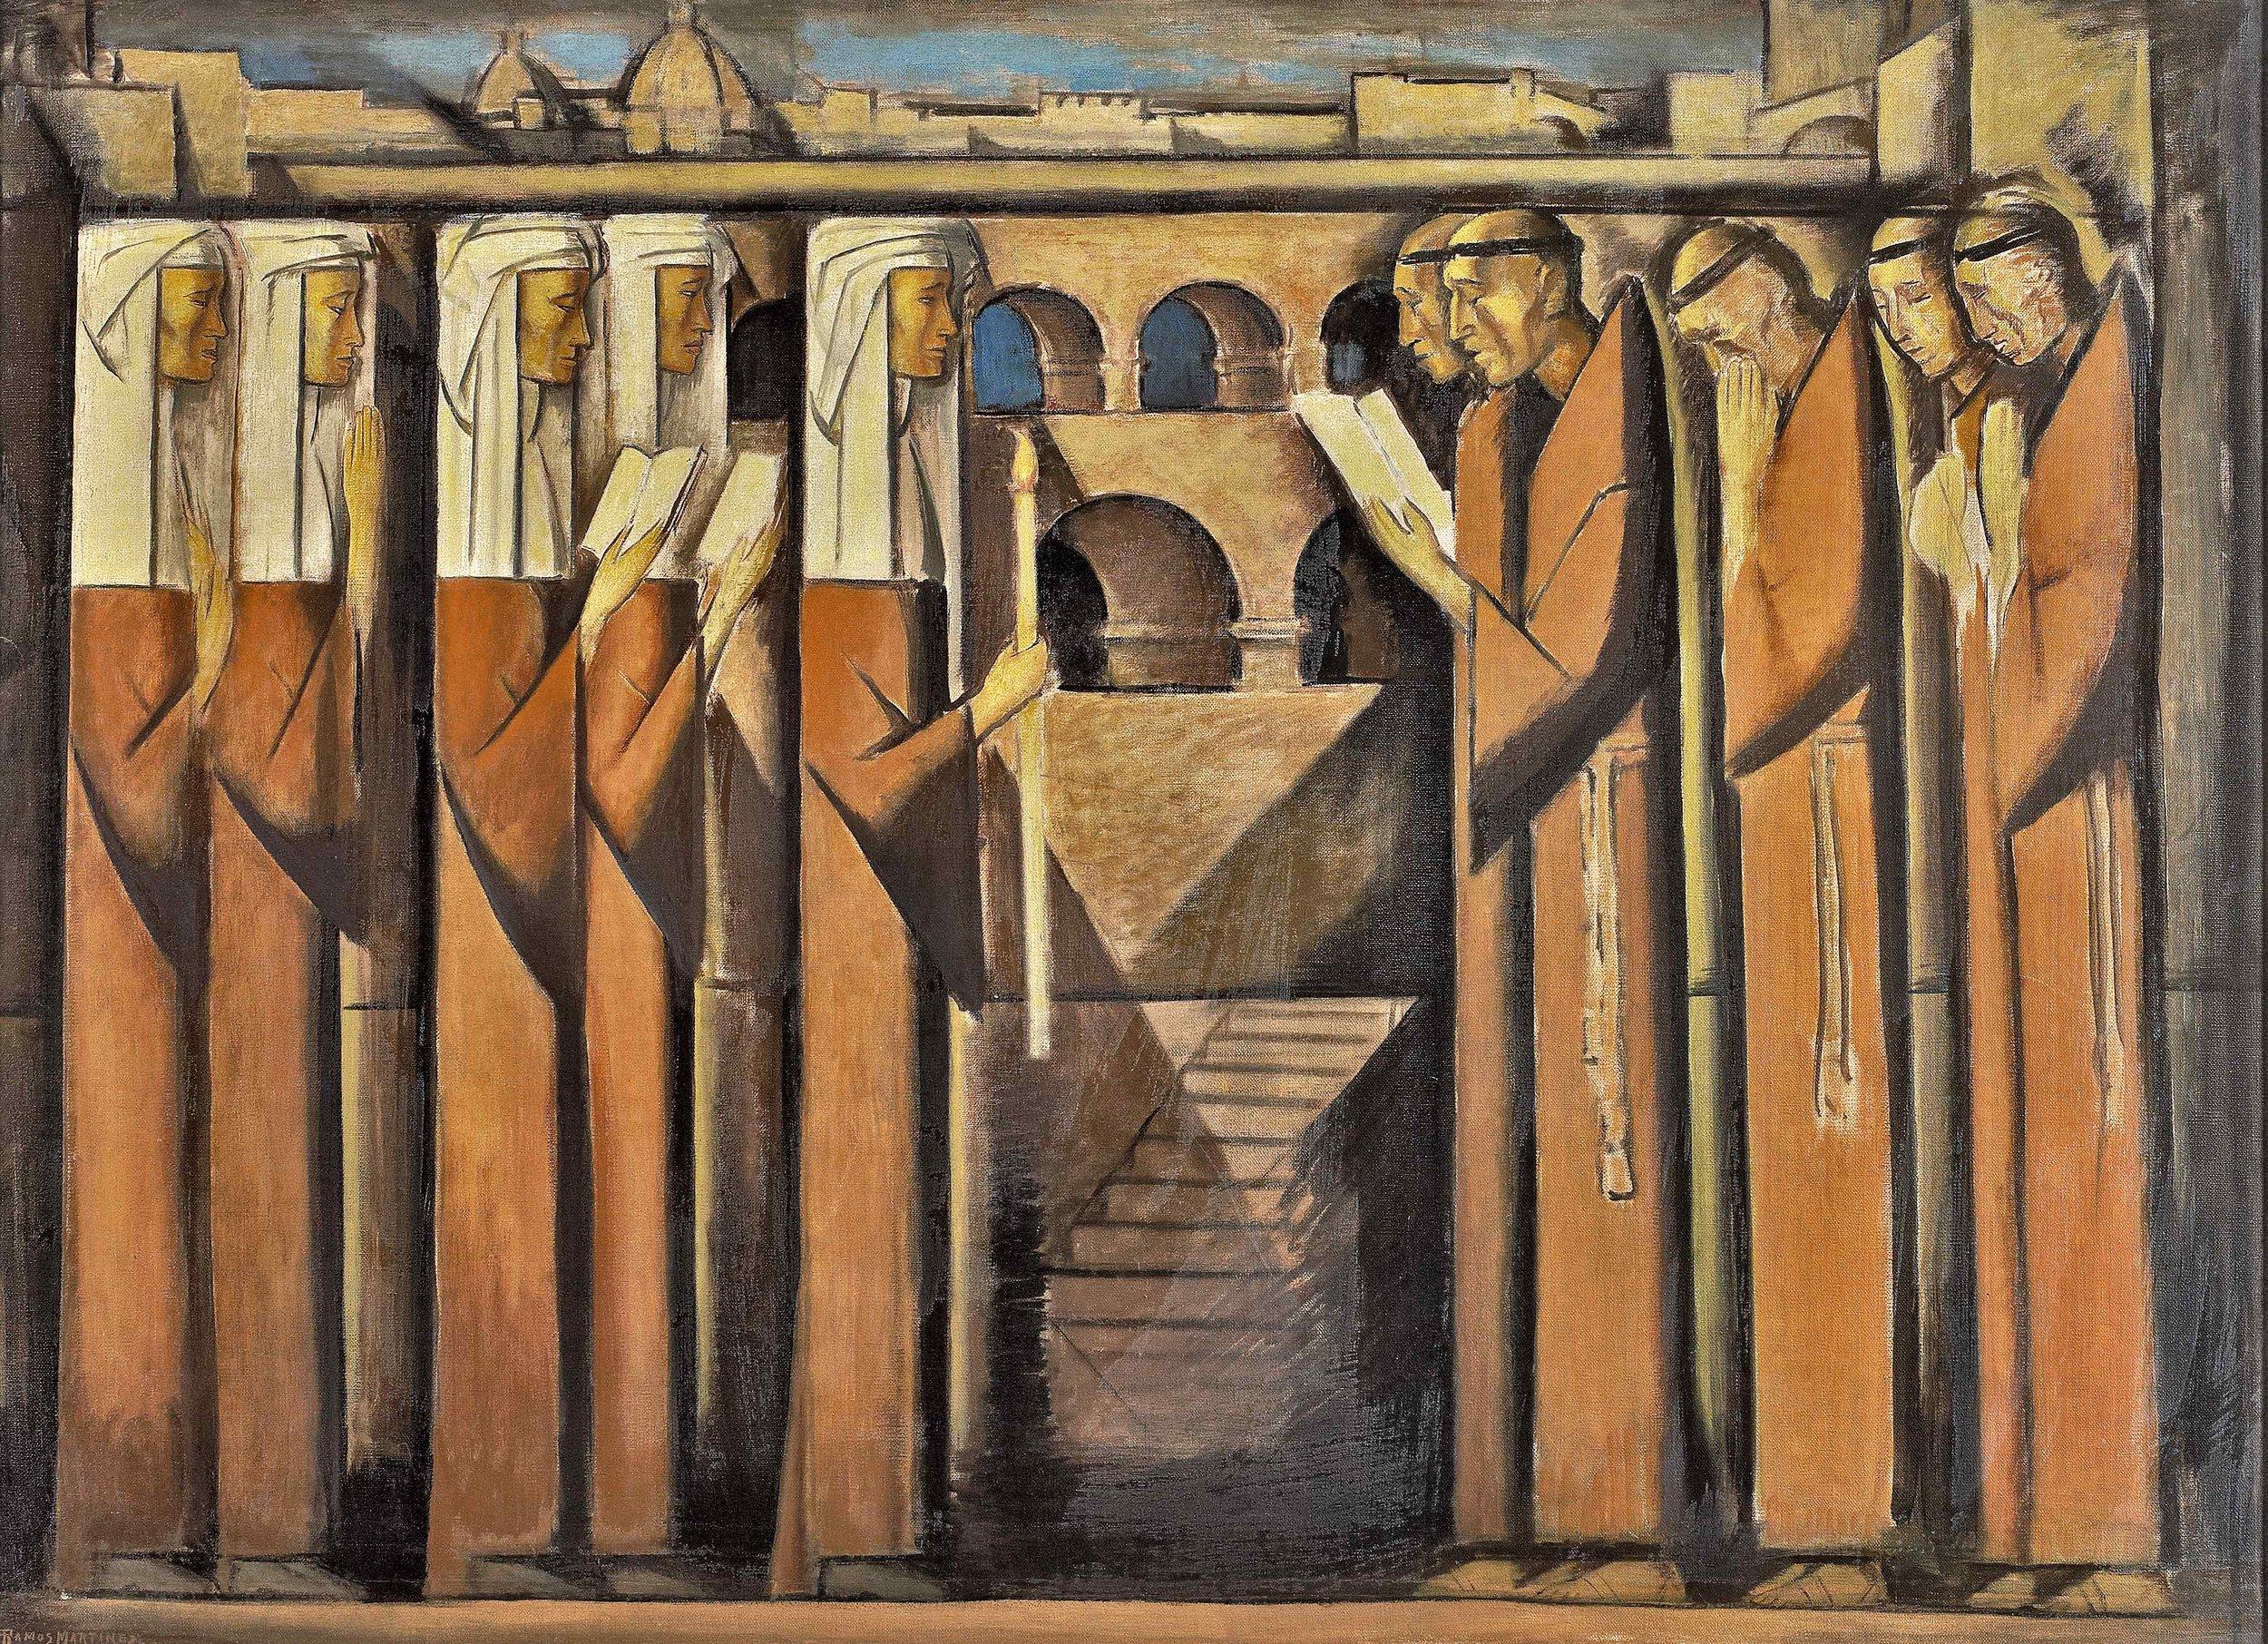 Monjas y Franciscanos / Nuns and Franciscans  ca. 1938 oil on canvas / óleo sobre tela 30 x 40 inches; 76.2 x 101.6 centímetros